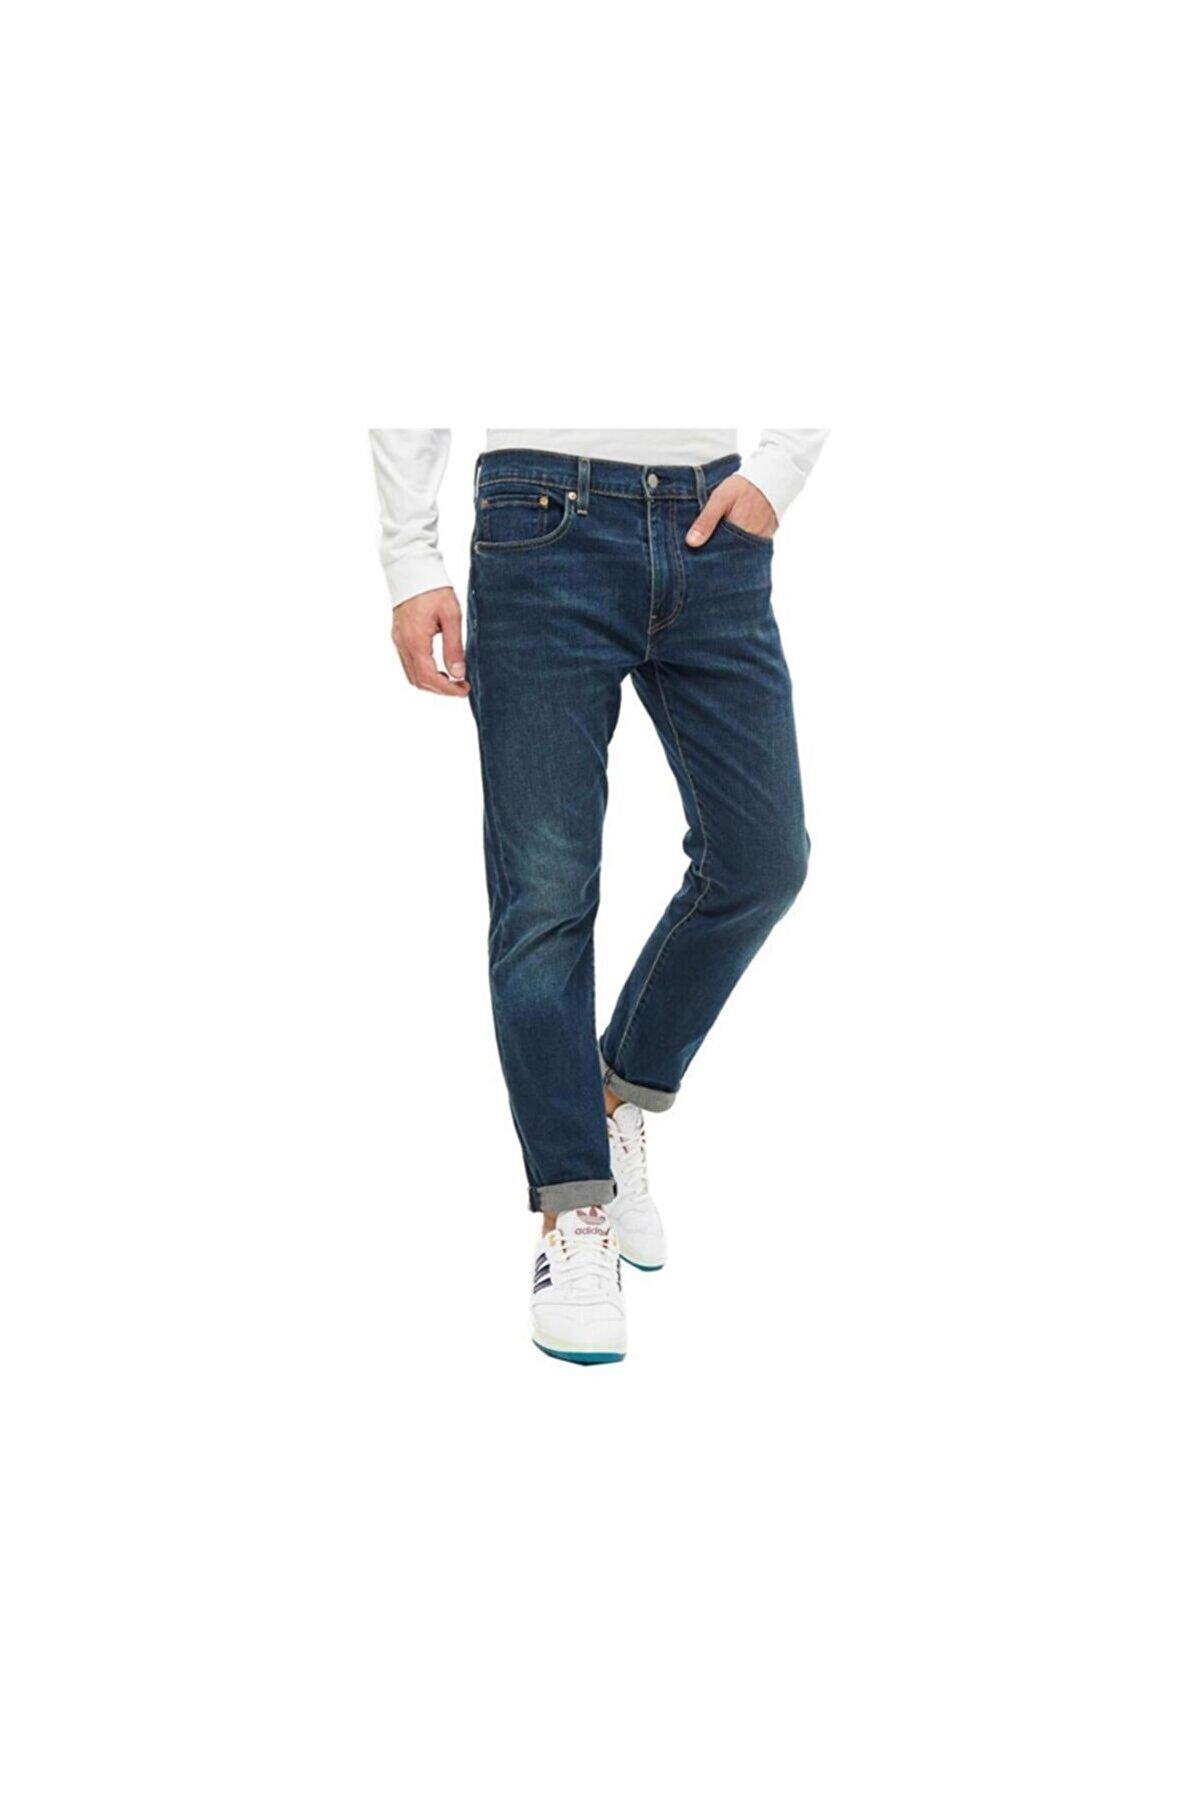 Levi's Erkek Jean Pantolon 514 Straight 00514-1512